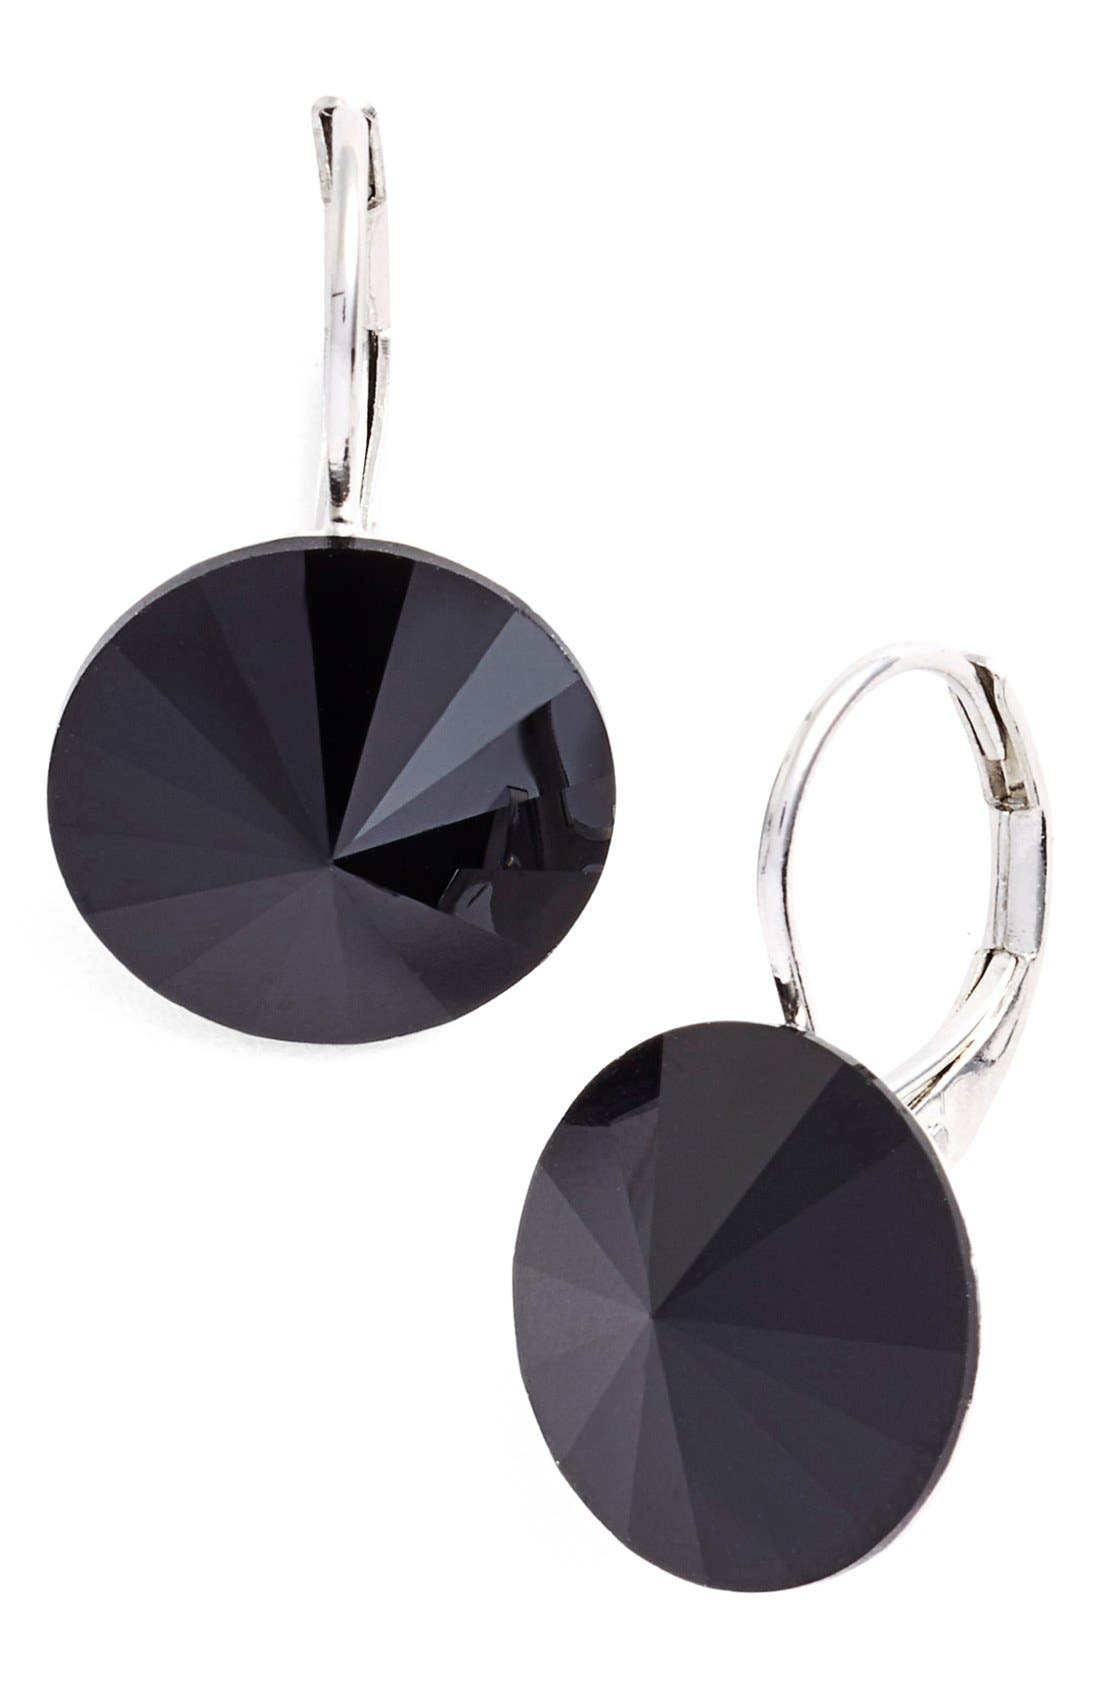 Alternate Image 1 Selected - L. Erickson 'Celeste' Round Crystal Drop Earrings